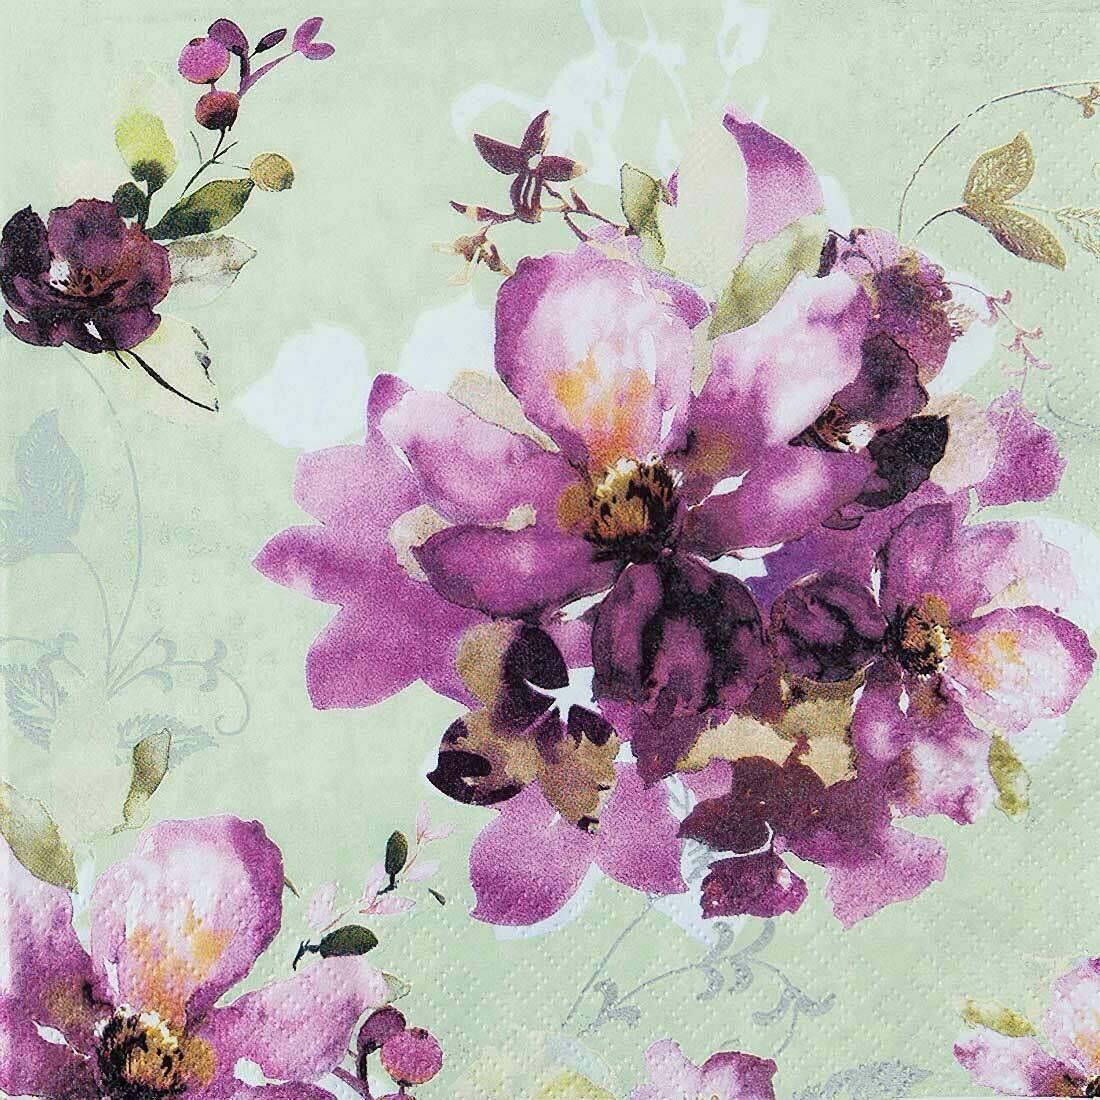 Decoupage Paper Napkins - Floral Ophelia 13x13 (1 Sheet)